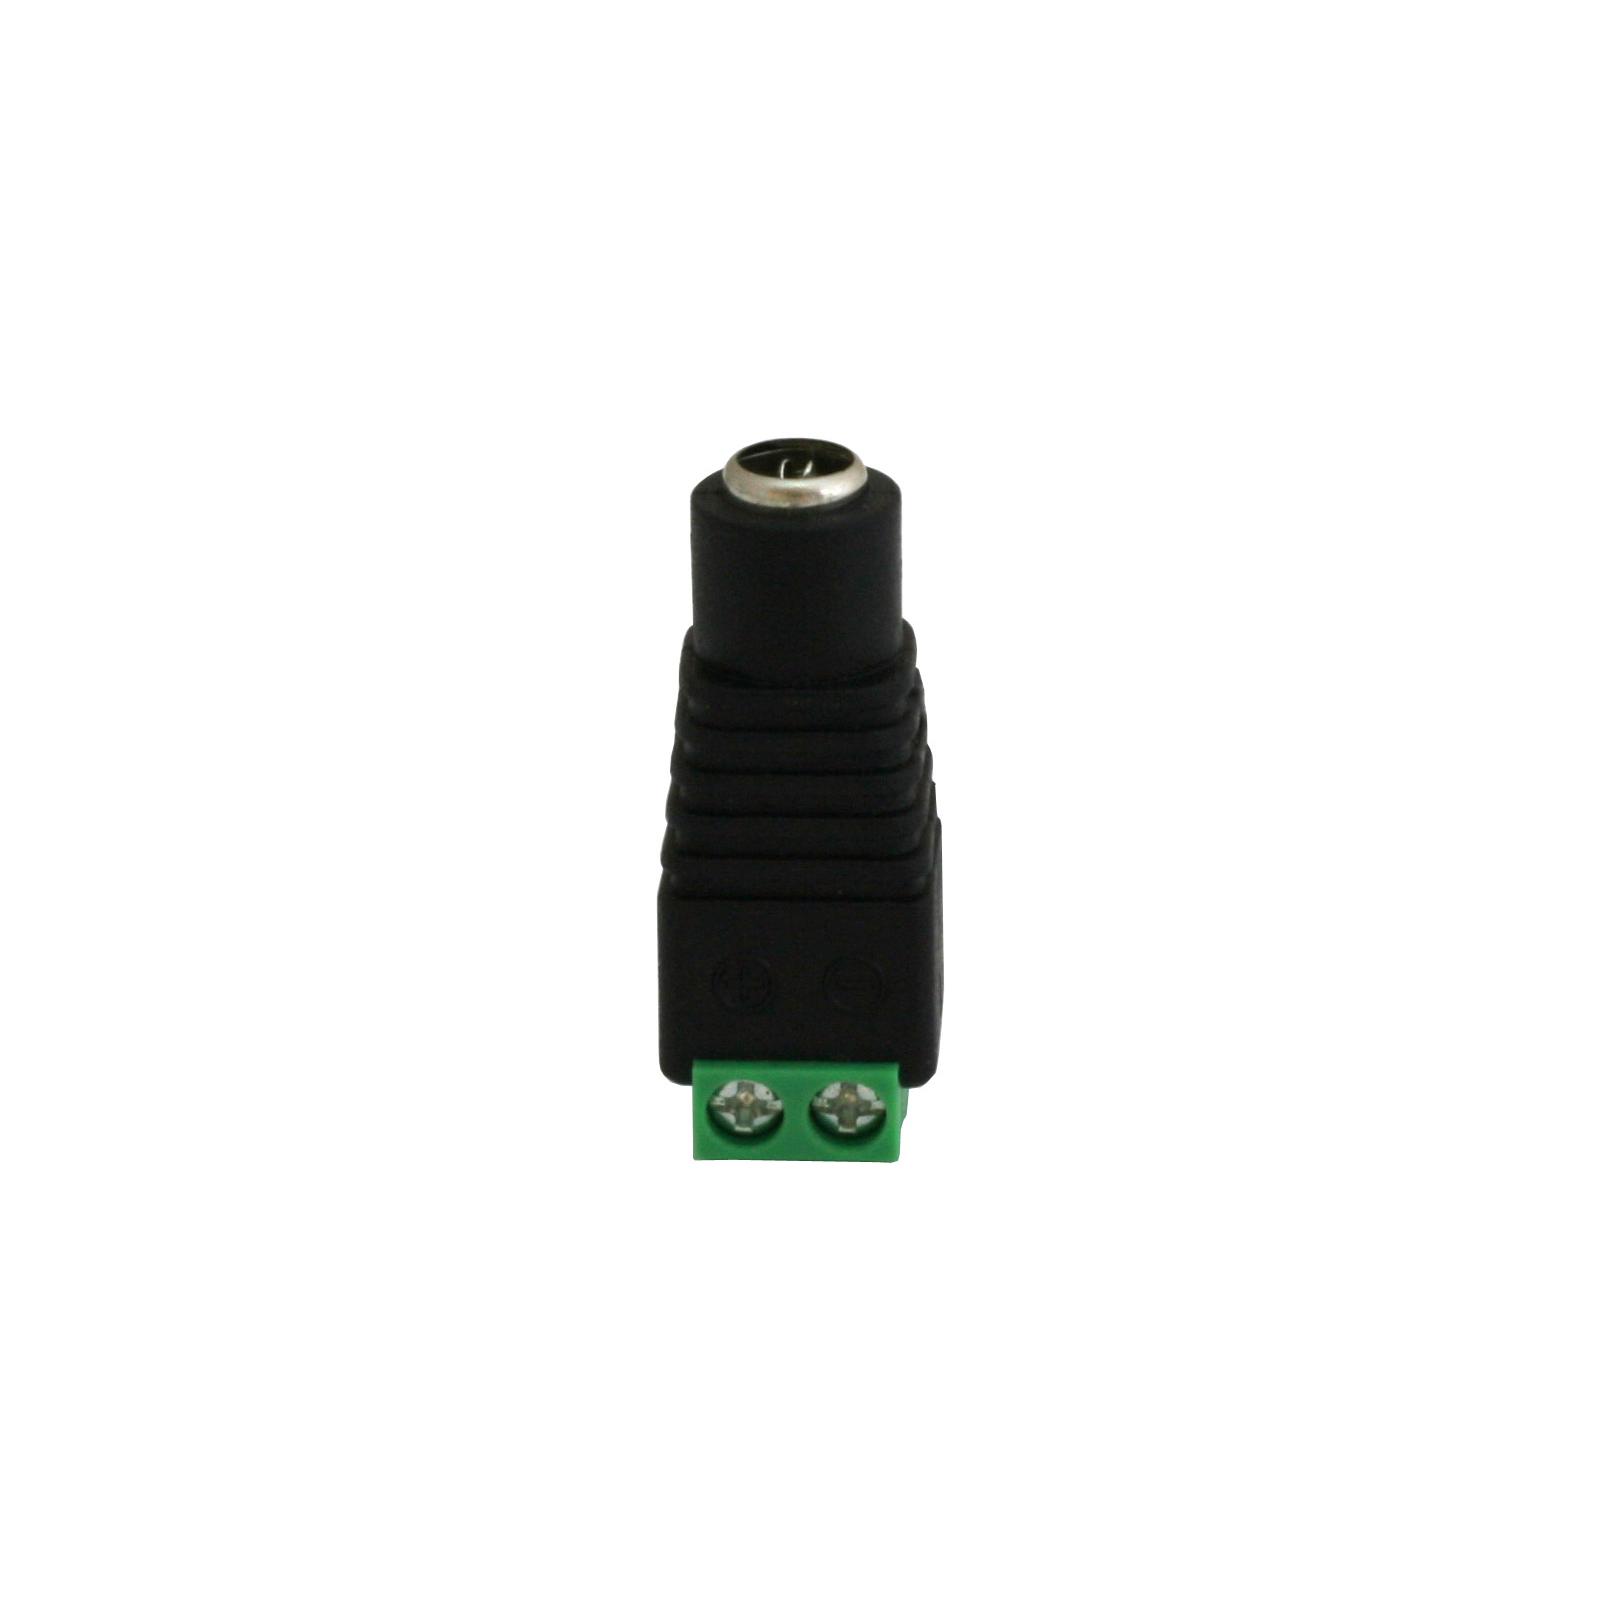 Коннектор GreenVision GV-DC female, 10 шт. (3746) изображение 3